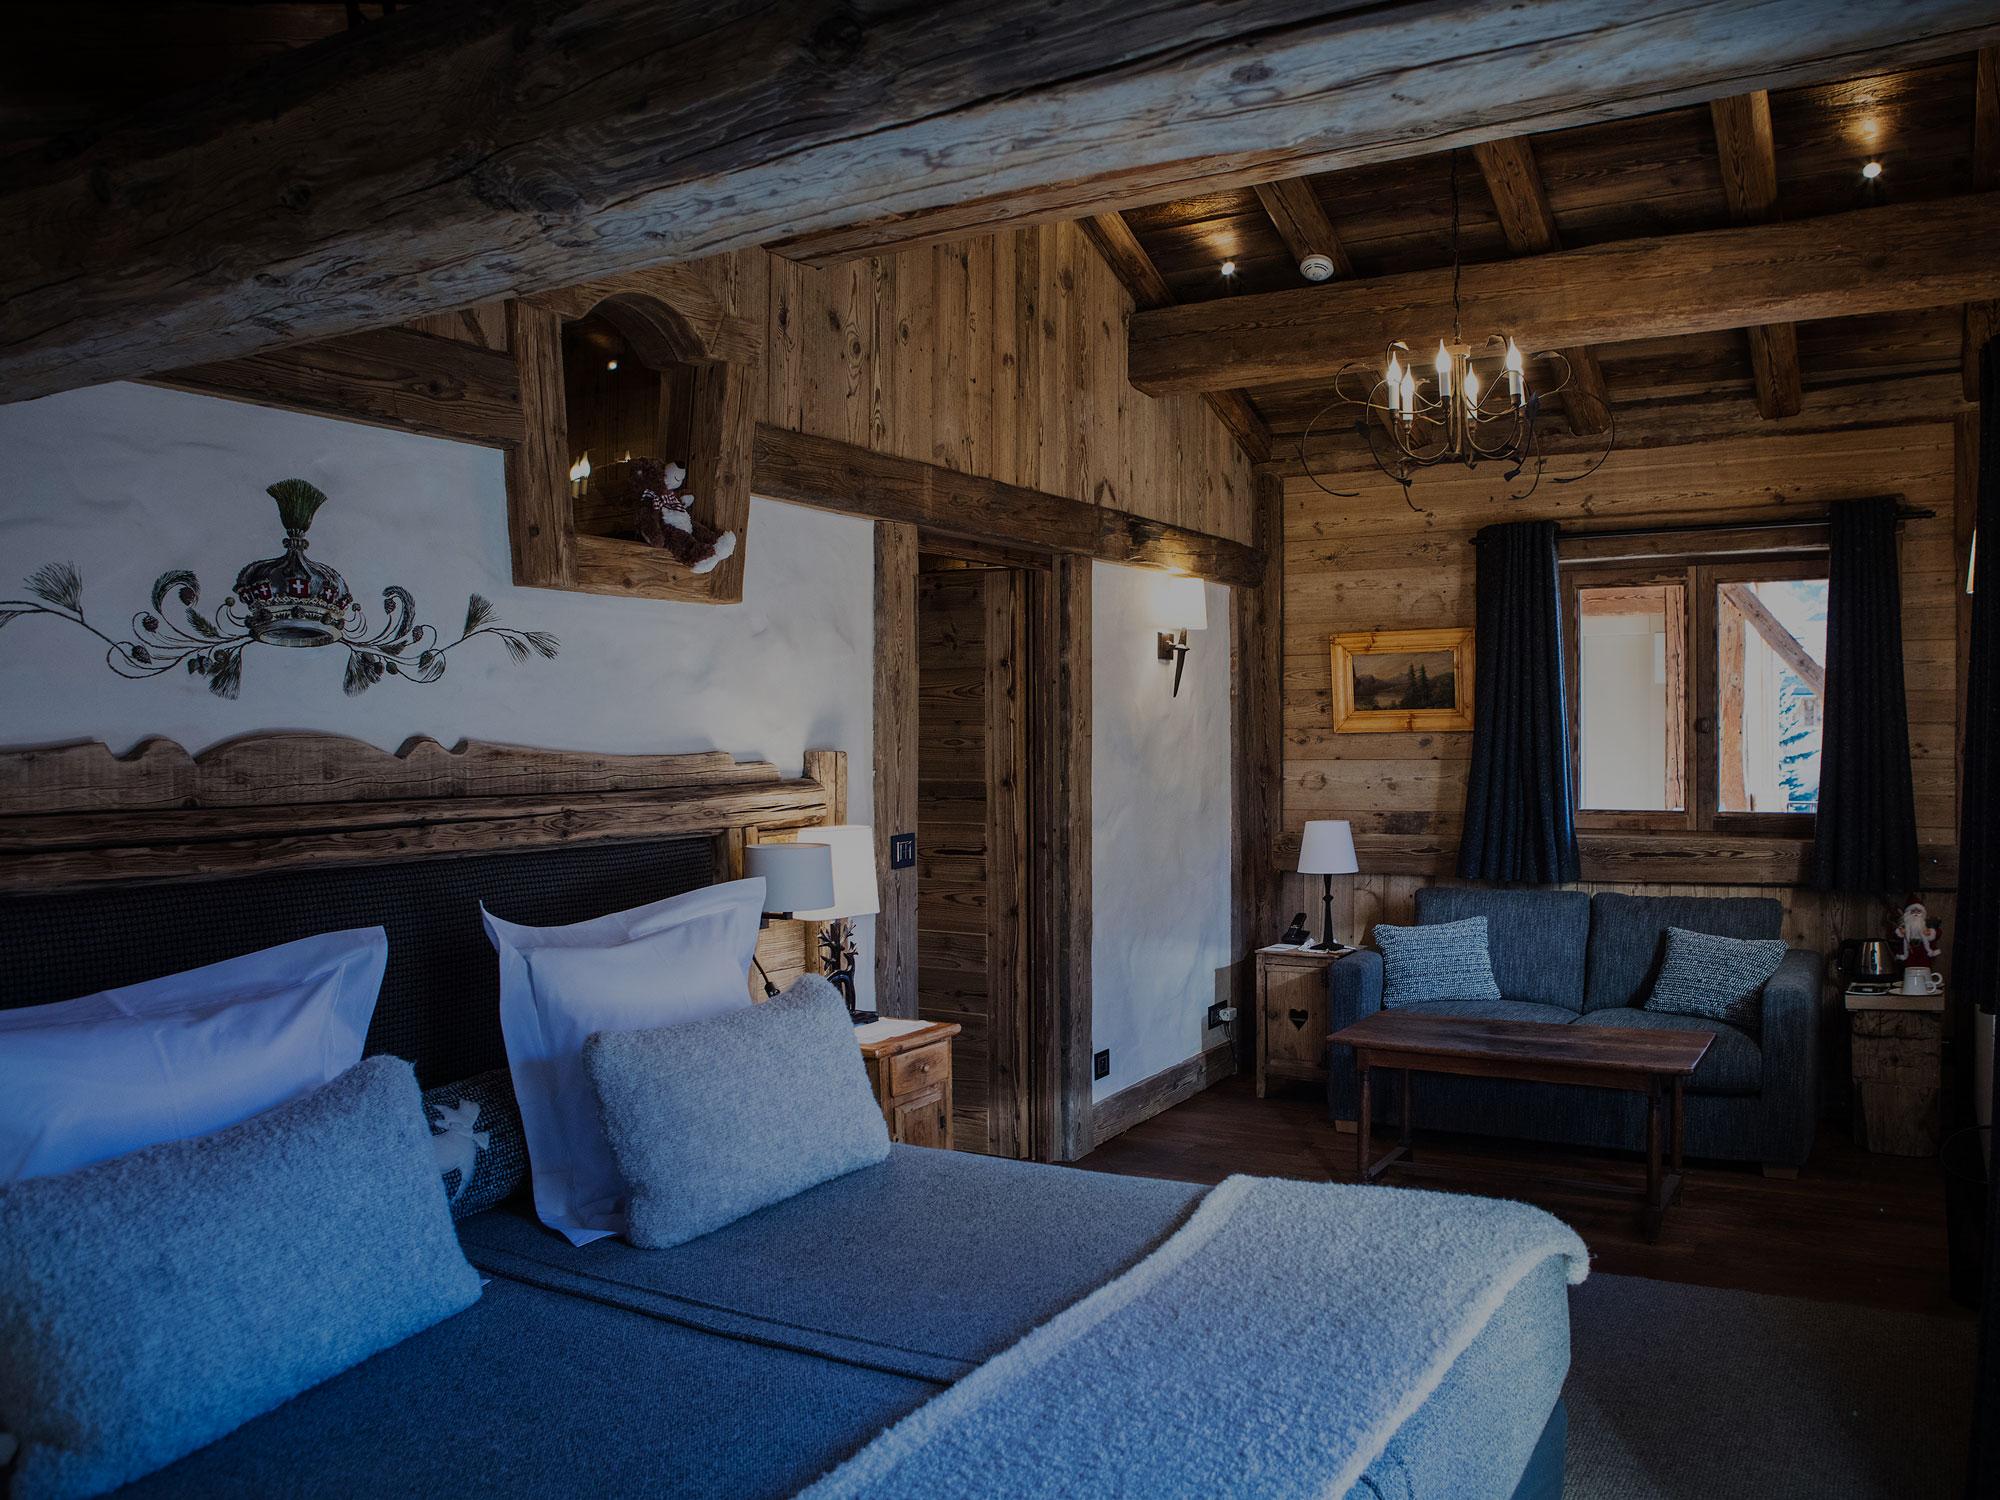 menuiserie-interieure-martinod-home2-1